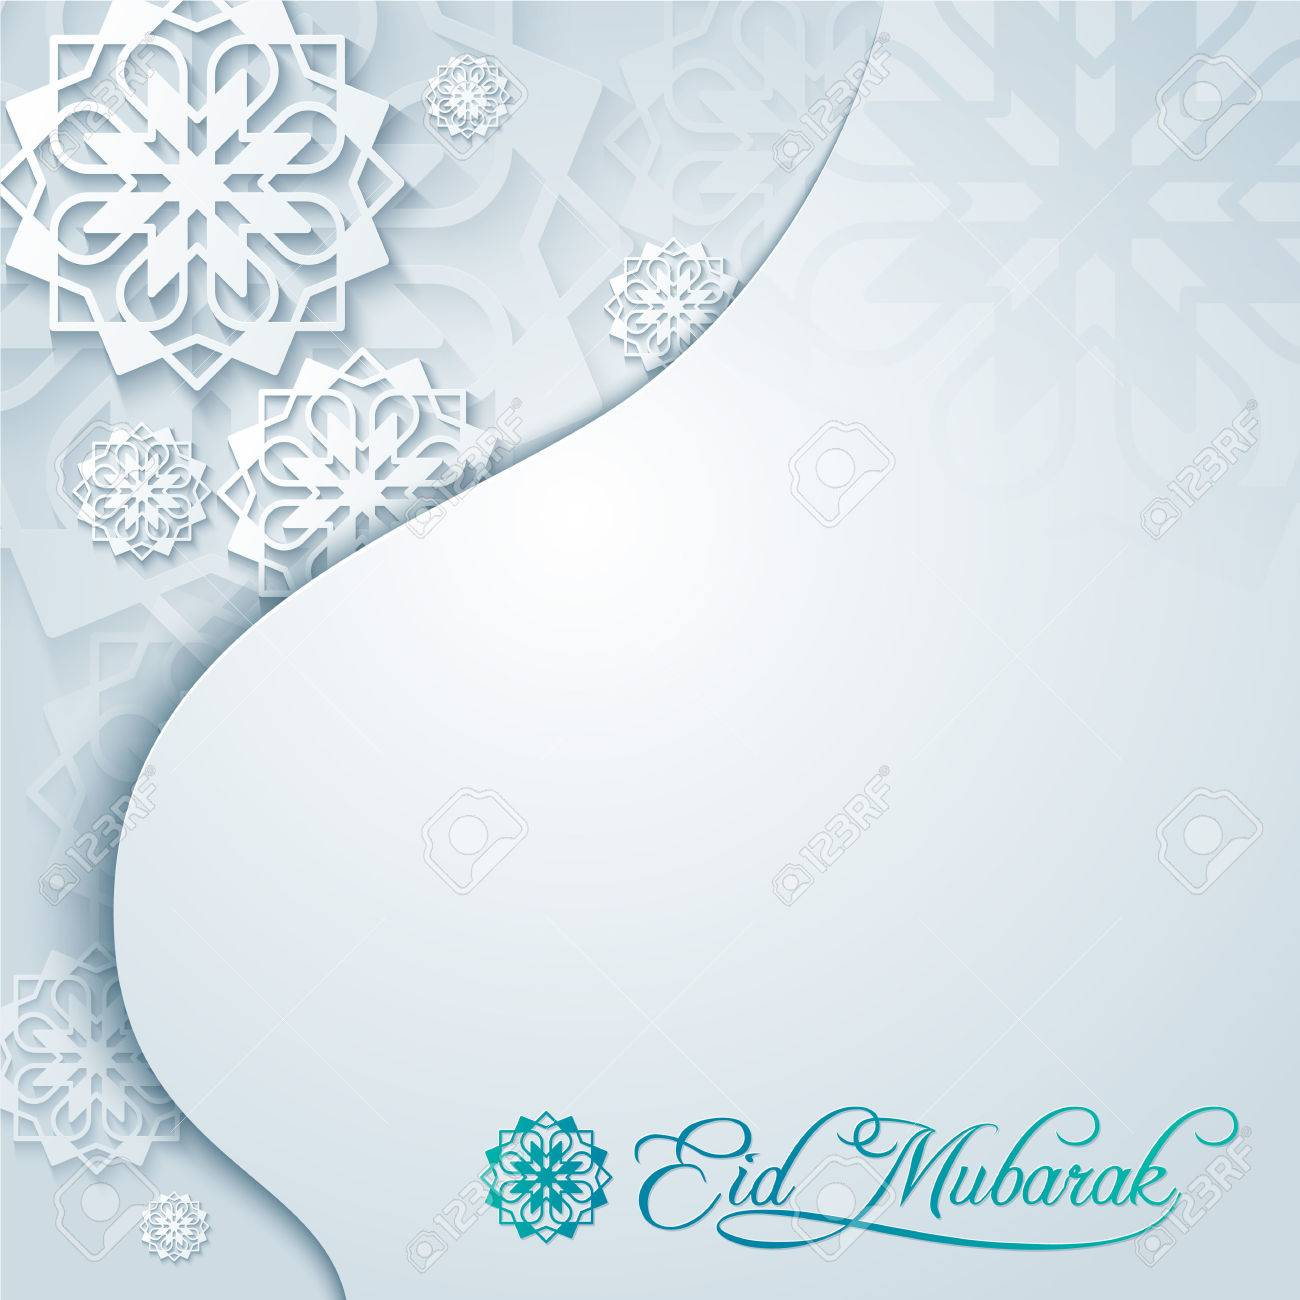 Eid mubarak background greeting card with arabic pattern and eid mubarak background greeting card with arabic pattern and mosque dome silhouette stock vector 56801199 kristyandbryce Choice Image